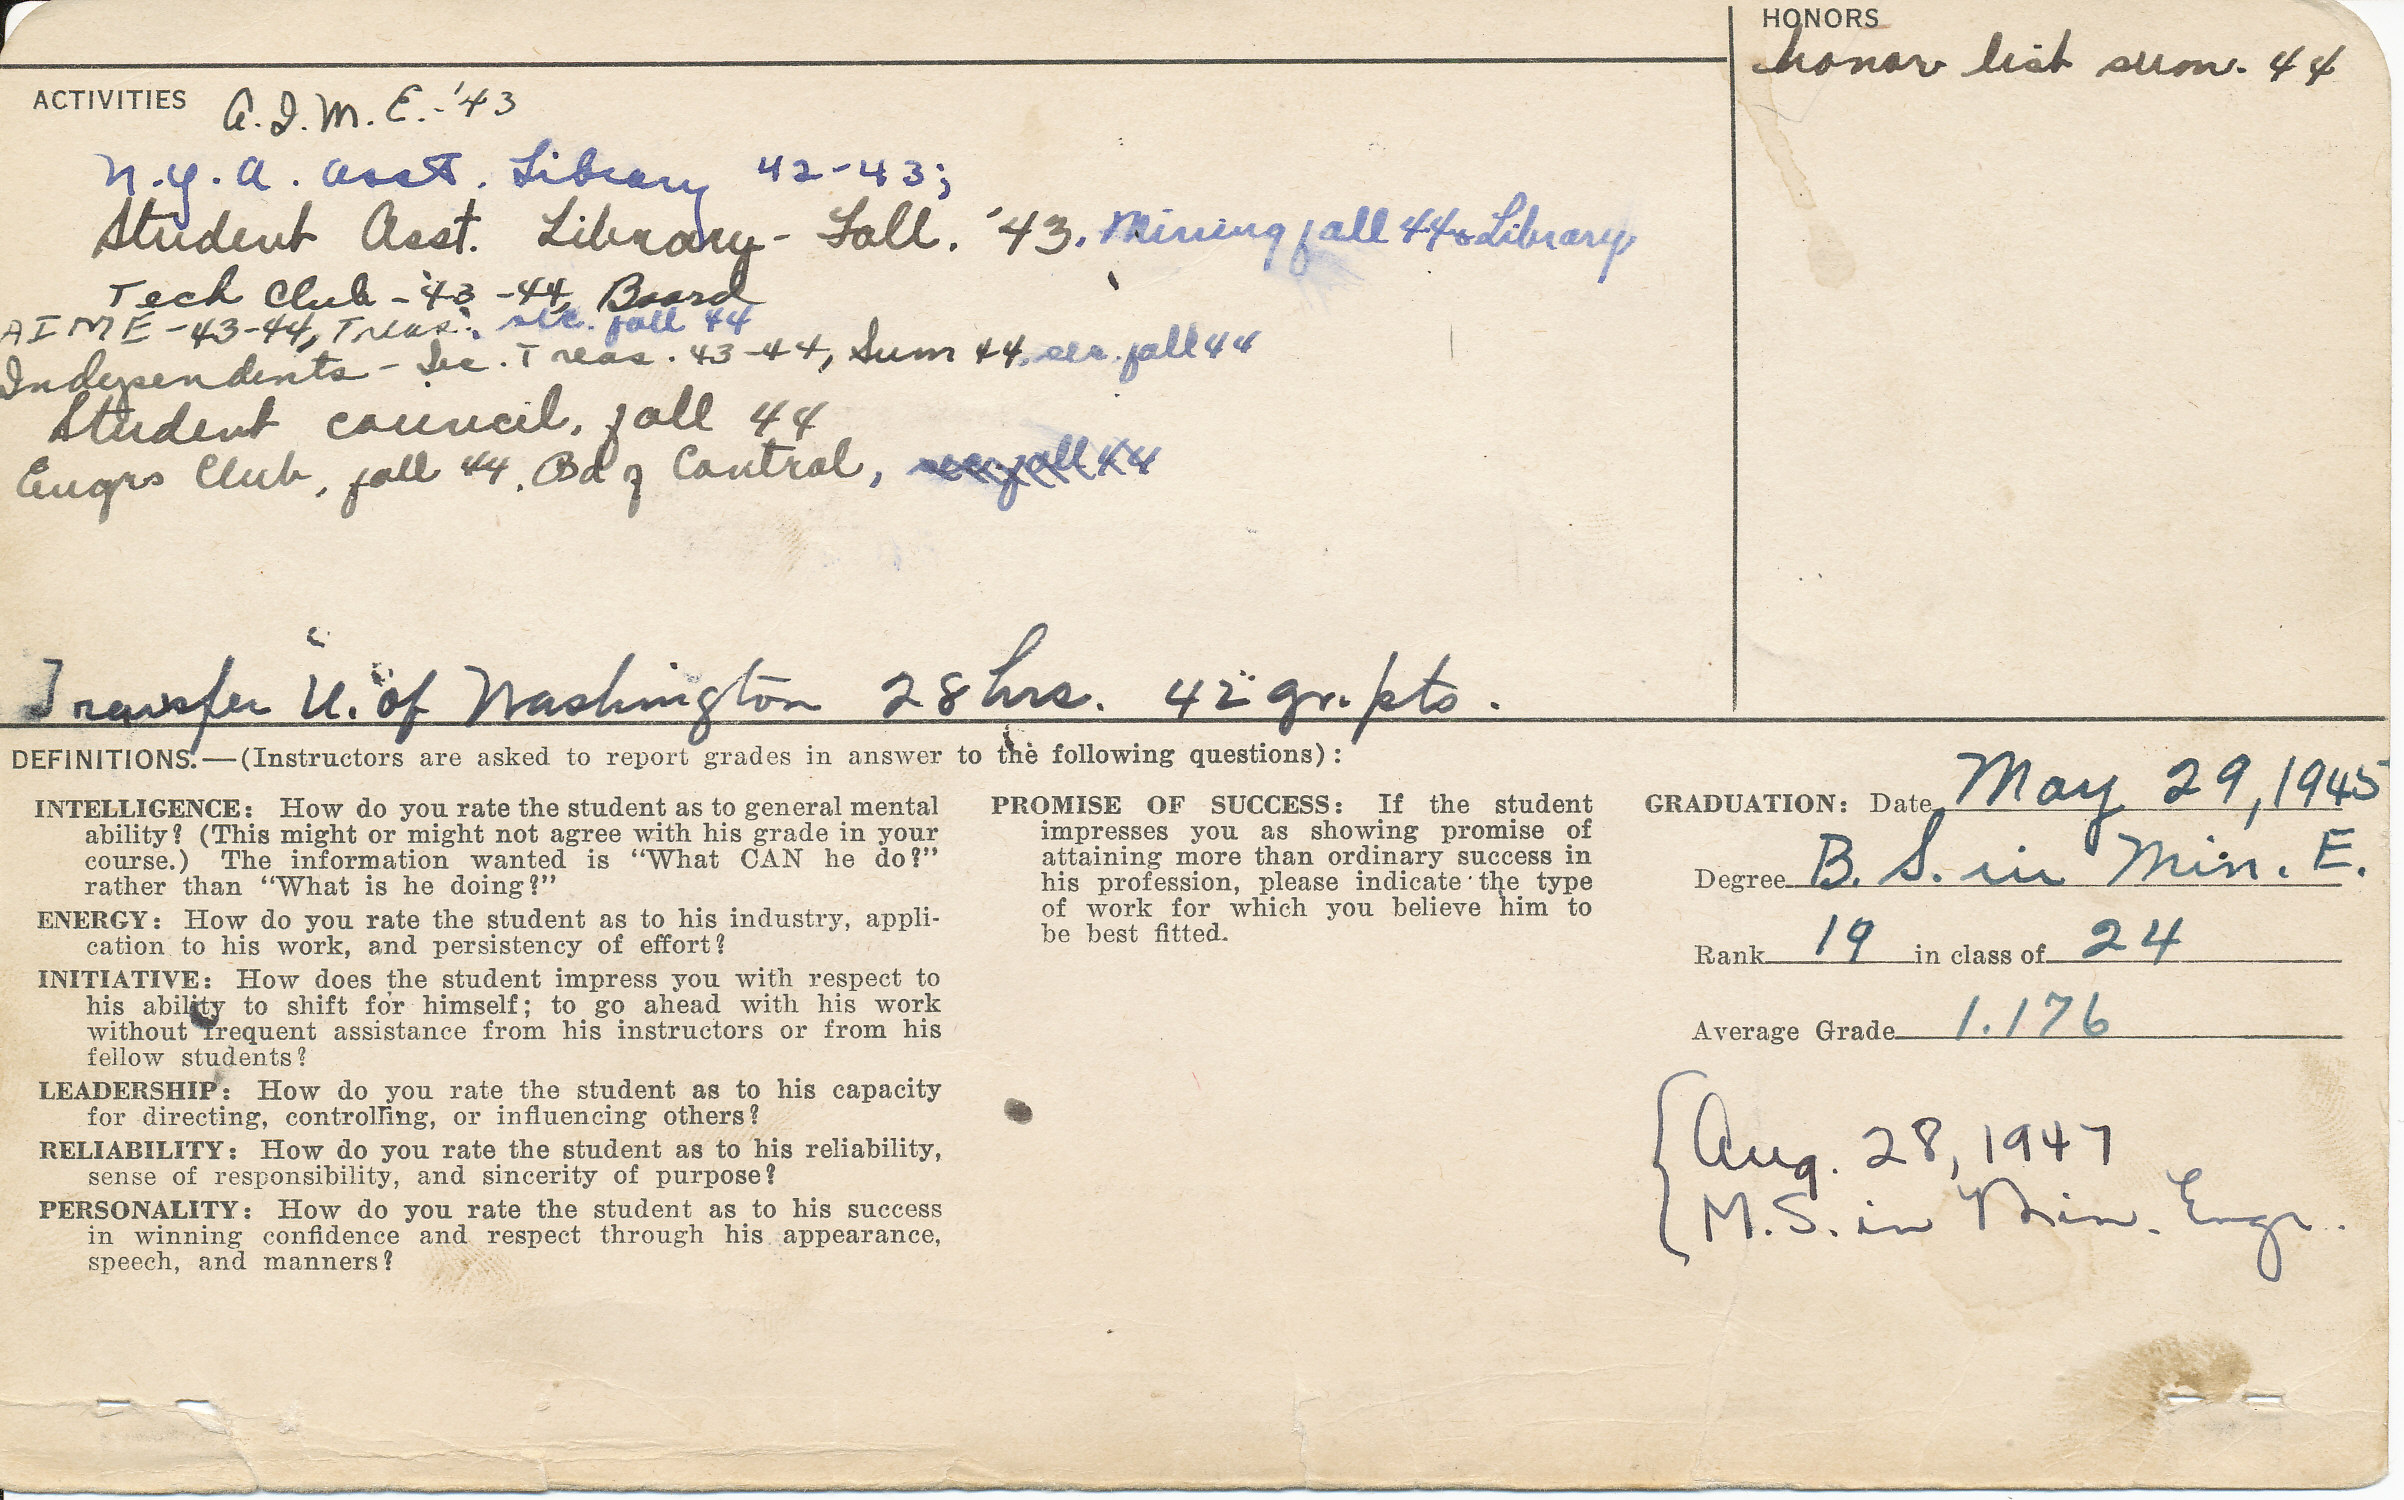 Kor Uyetake student card, side 2